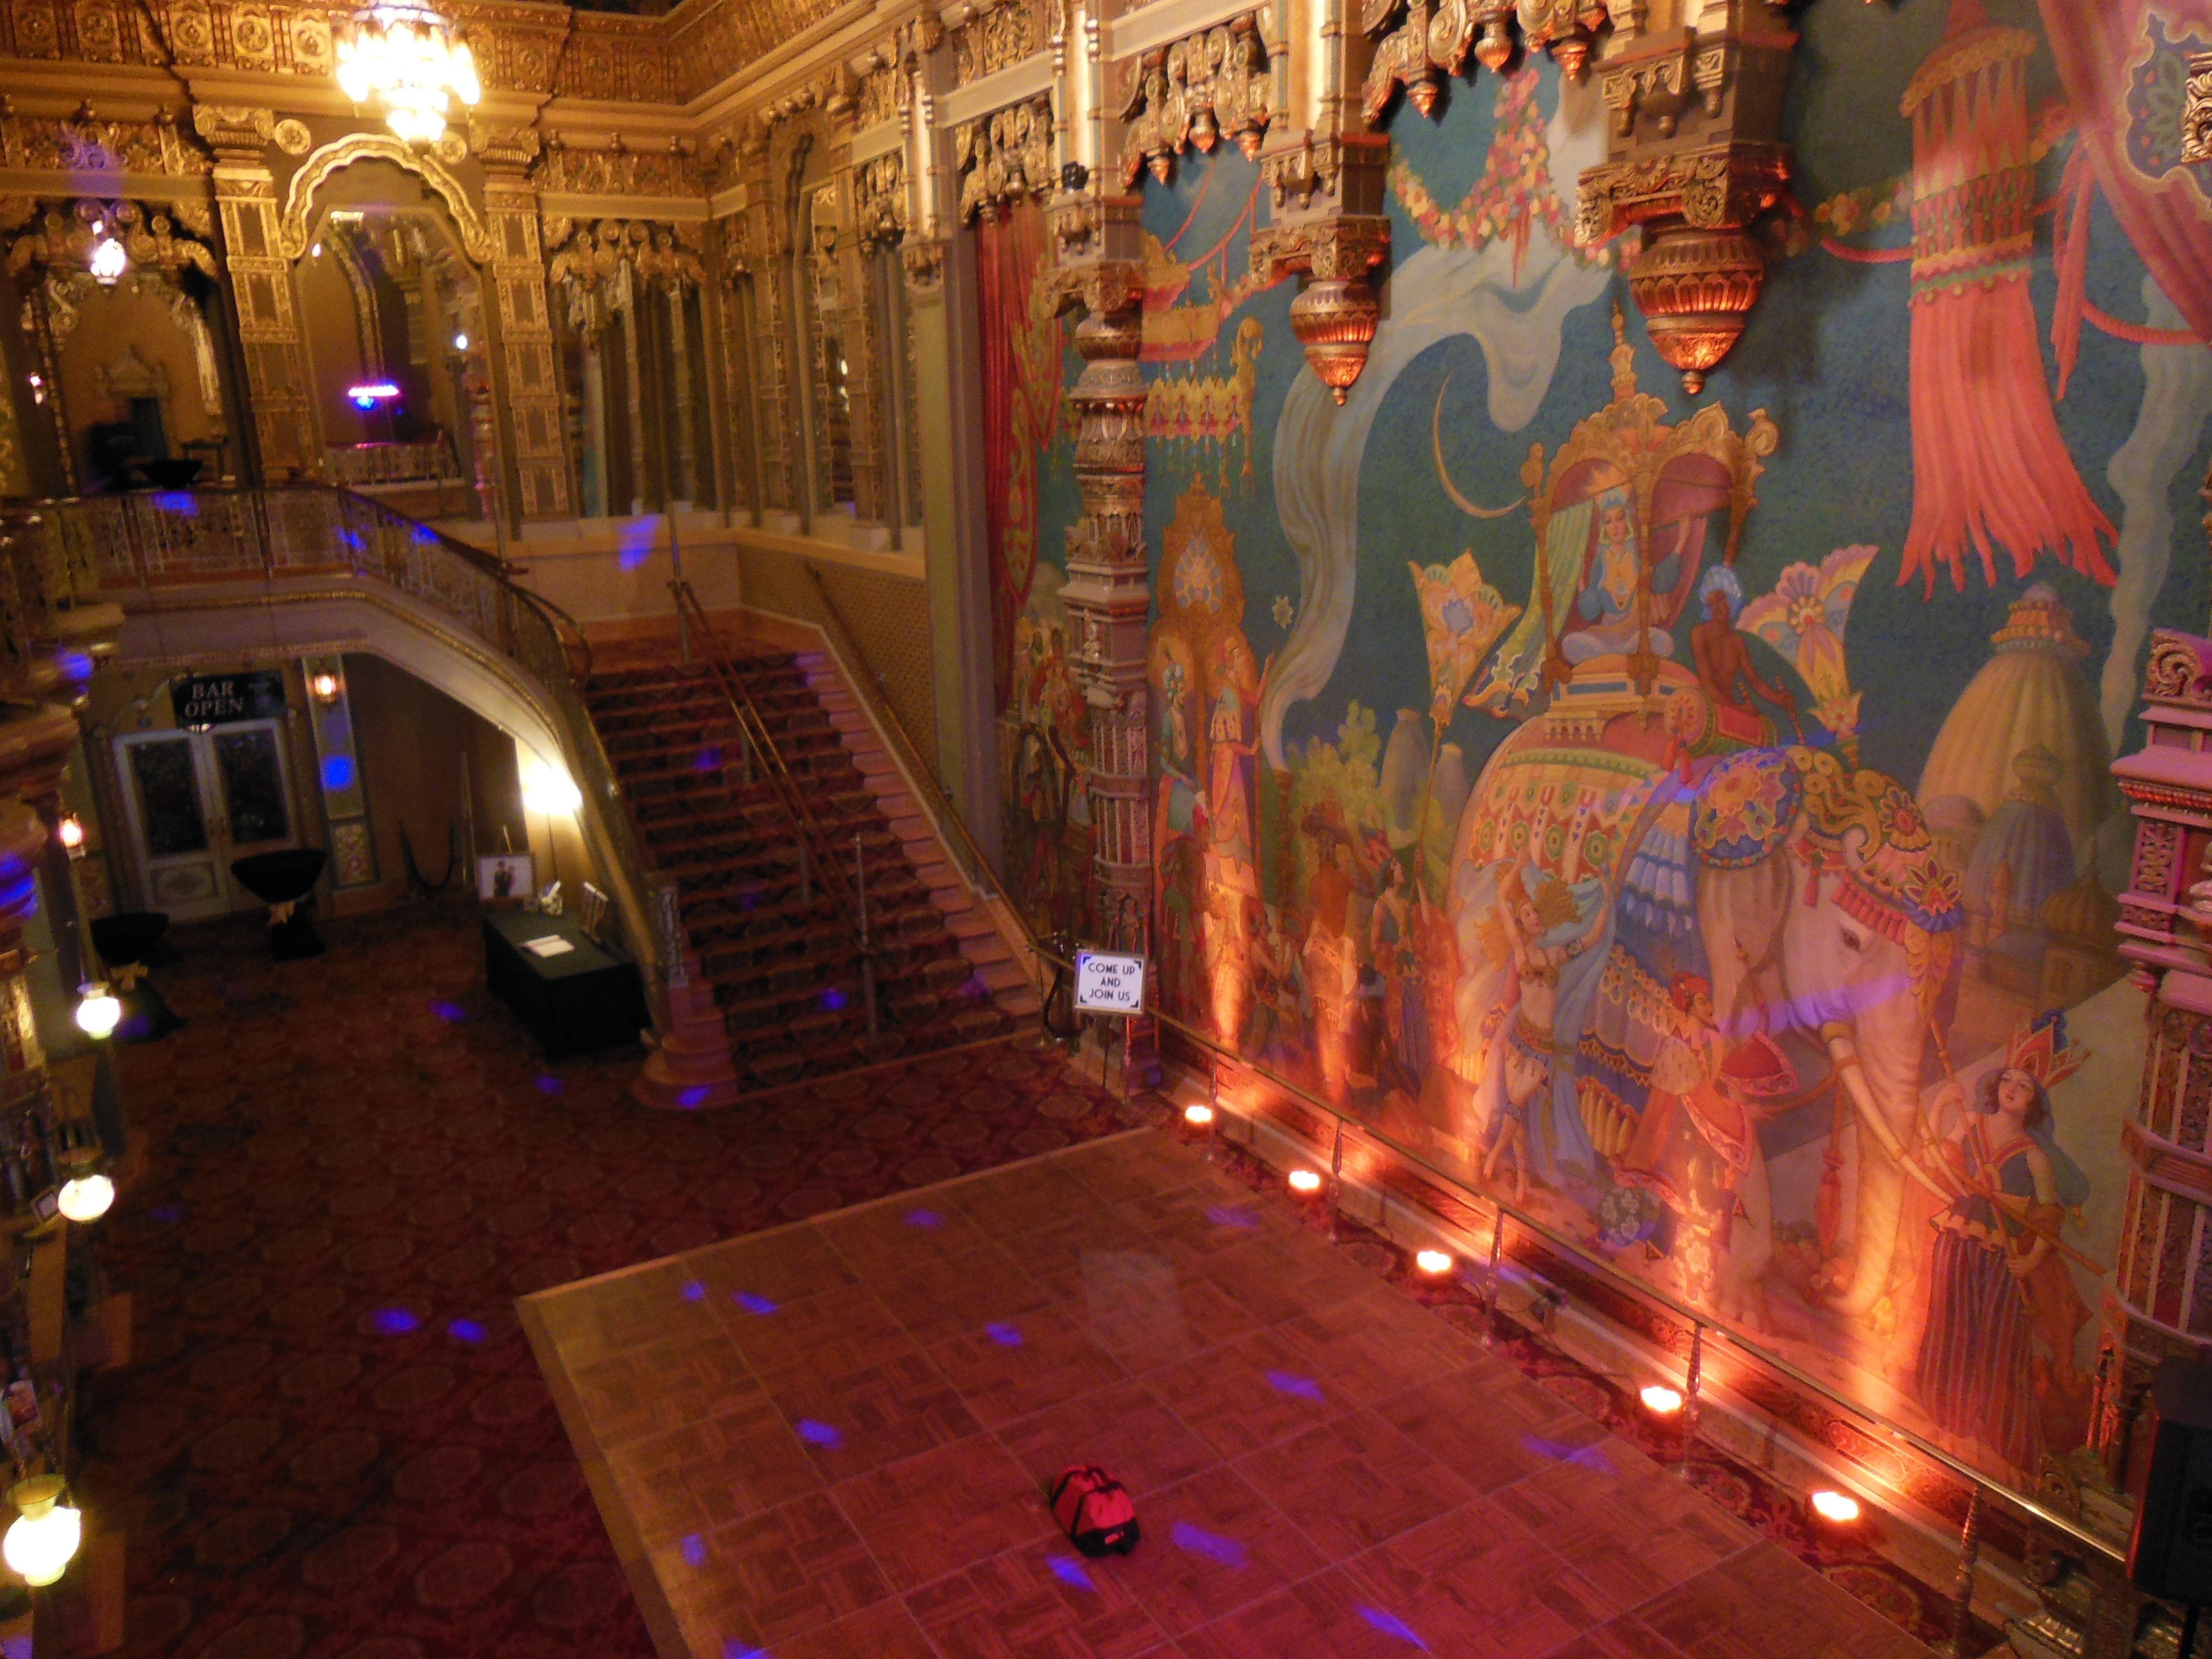 Landmark theater in syracuse ny wedding catered by phoebe s restaurant in syracuse ny